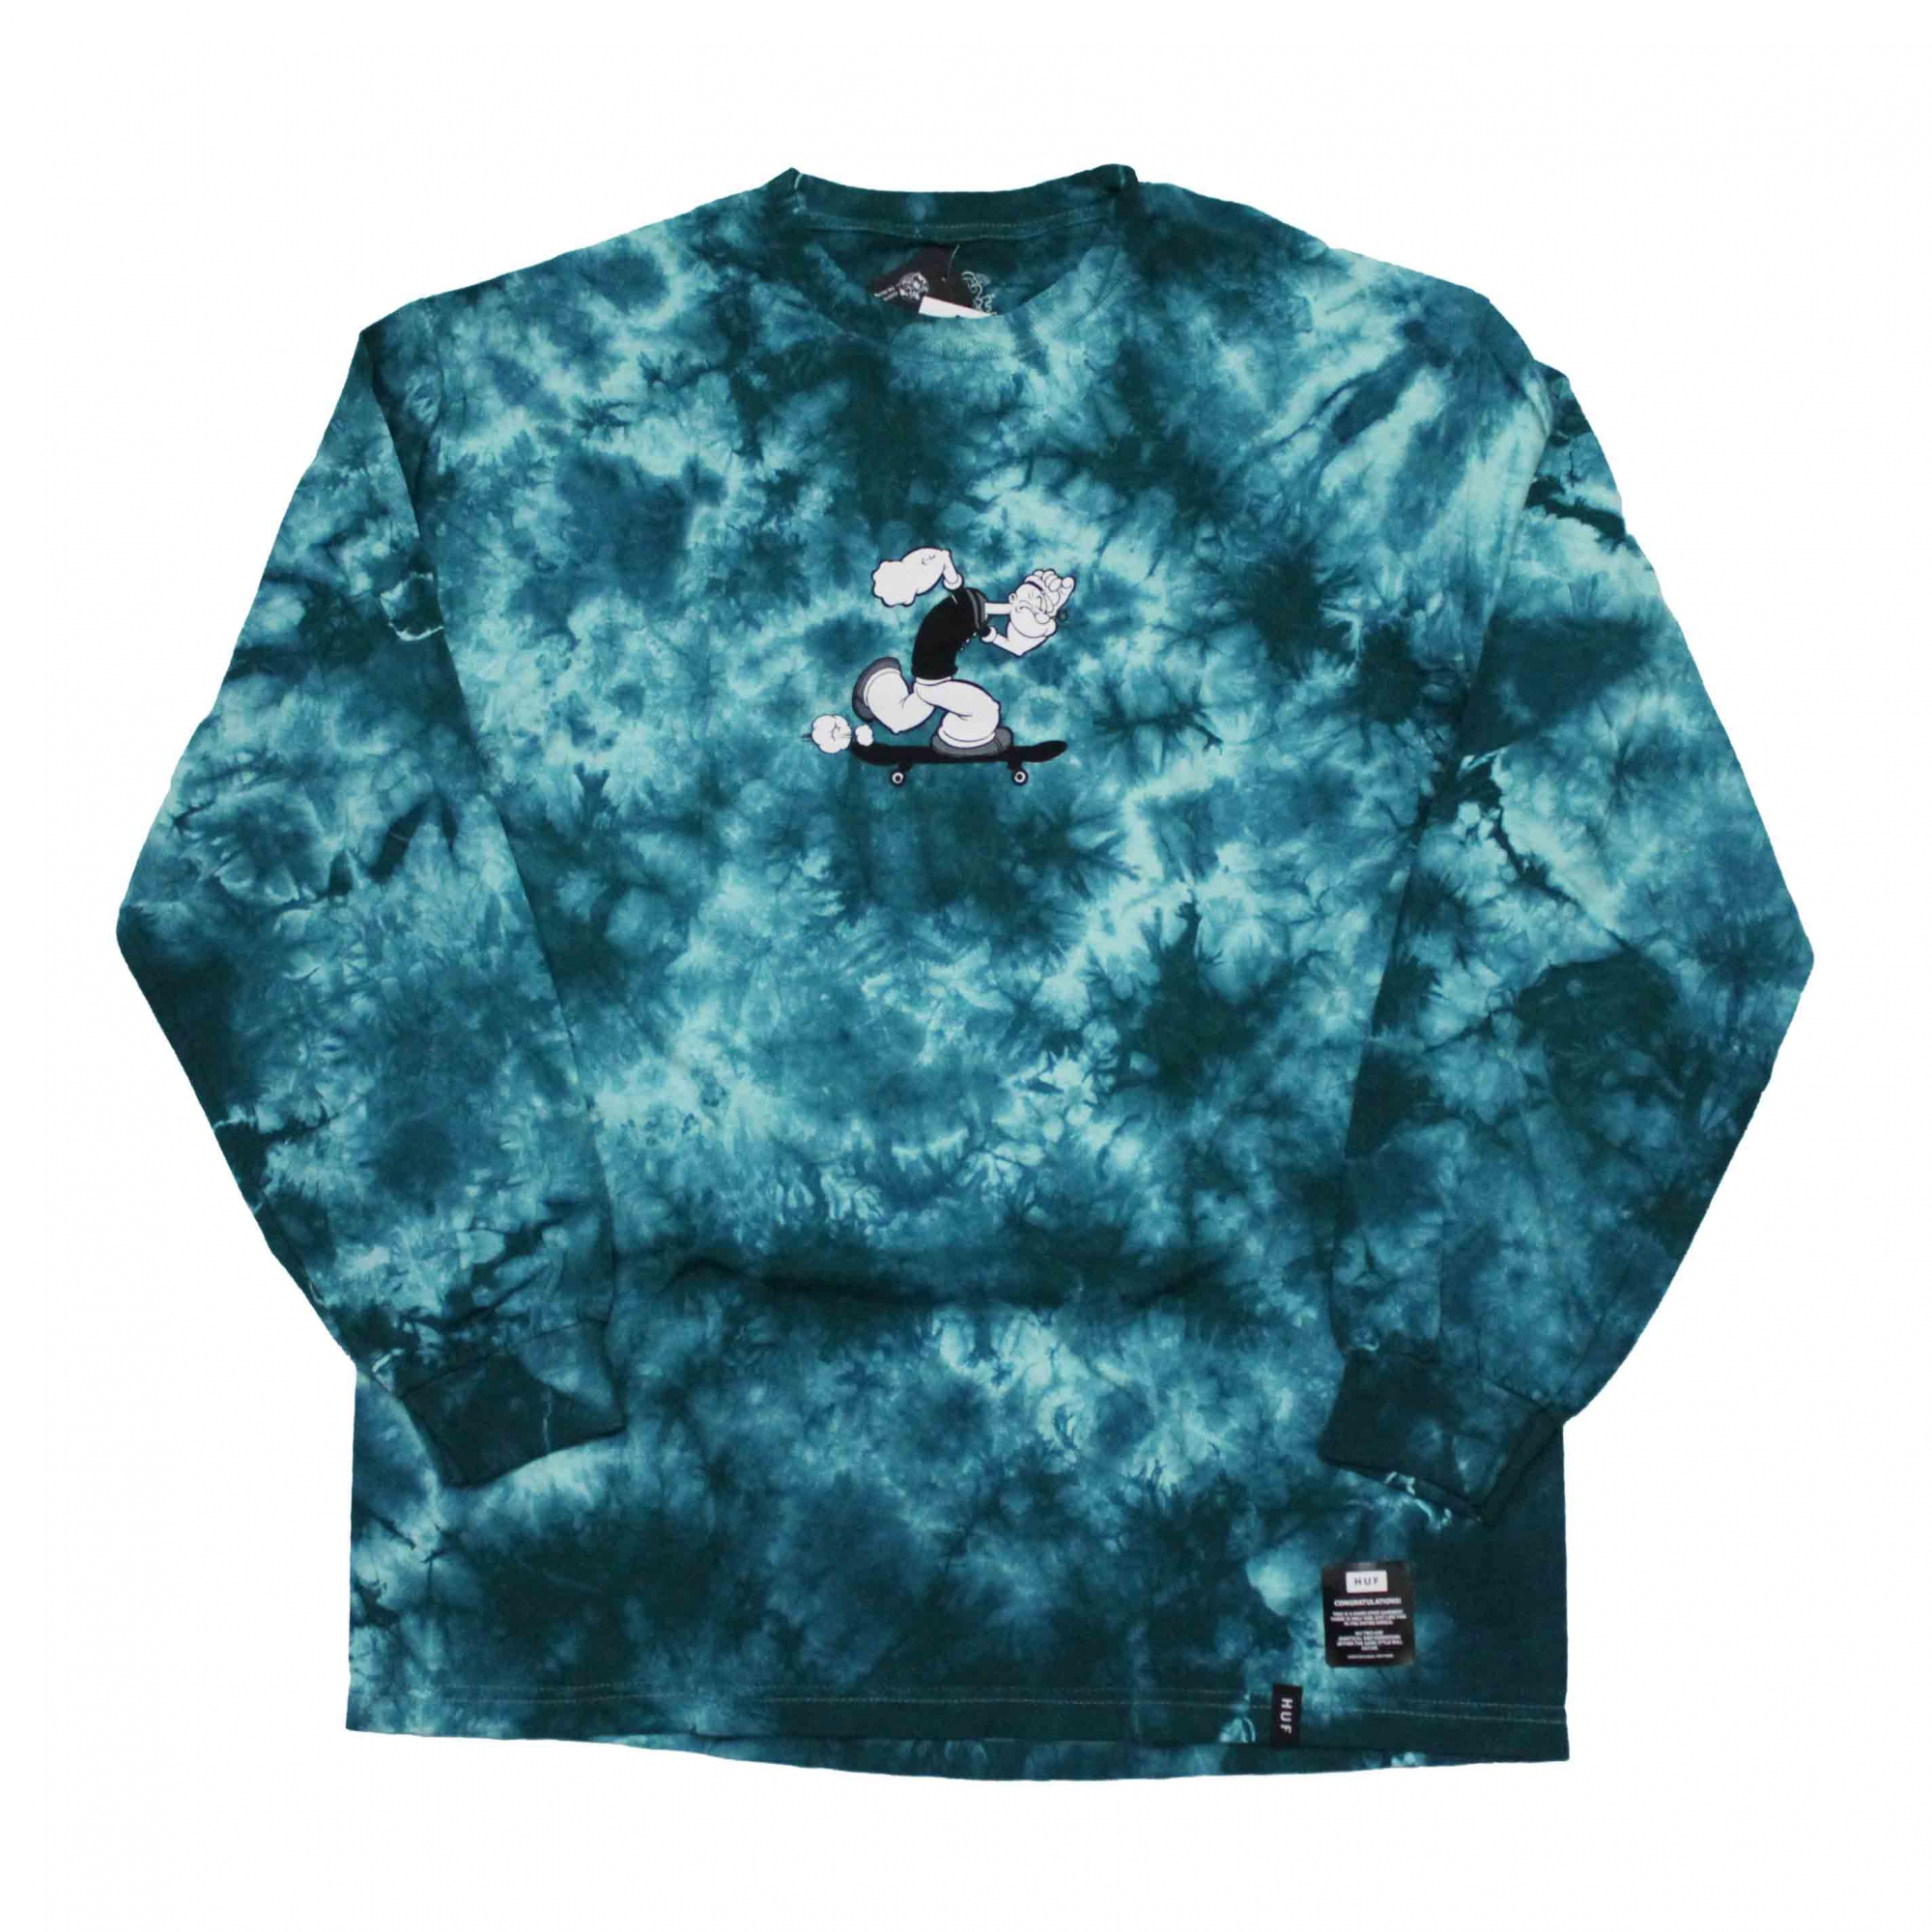 Camiseta Manga Longa HUF x Popeye Skates - Tie Dye Verde (Importado)